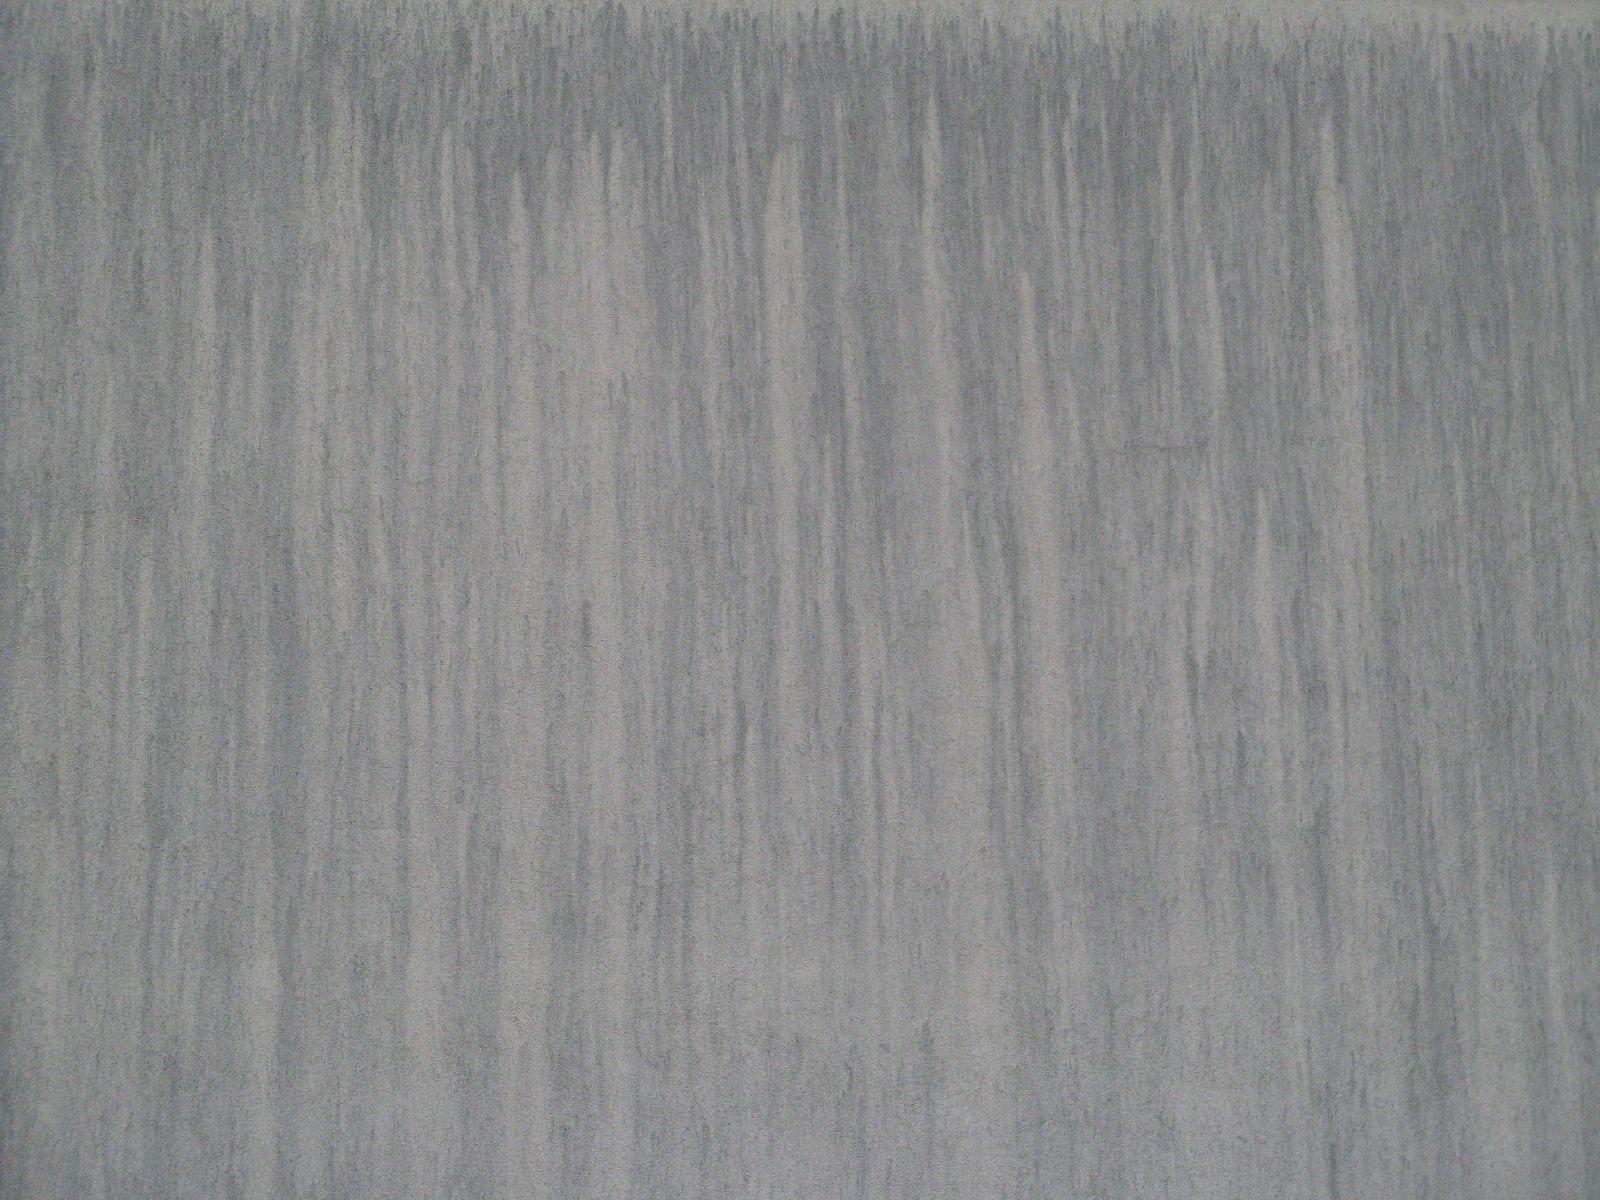 Metall_Textur_B_5629